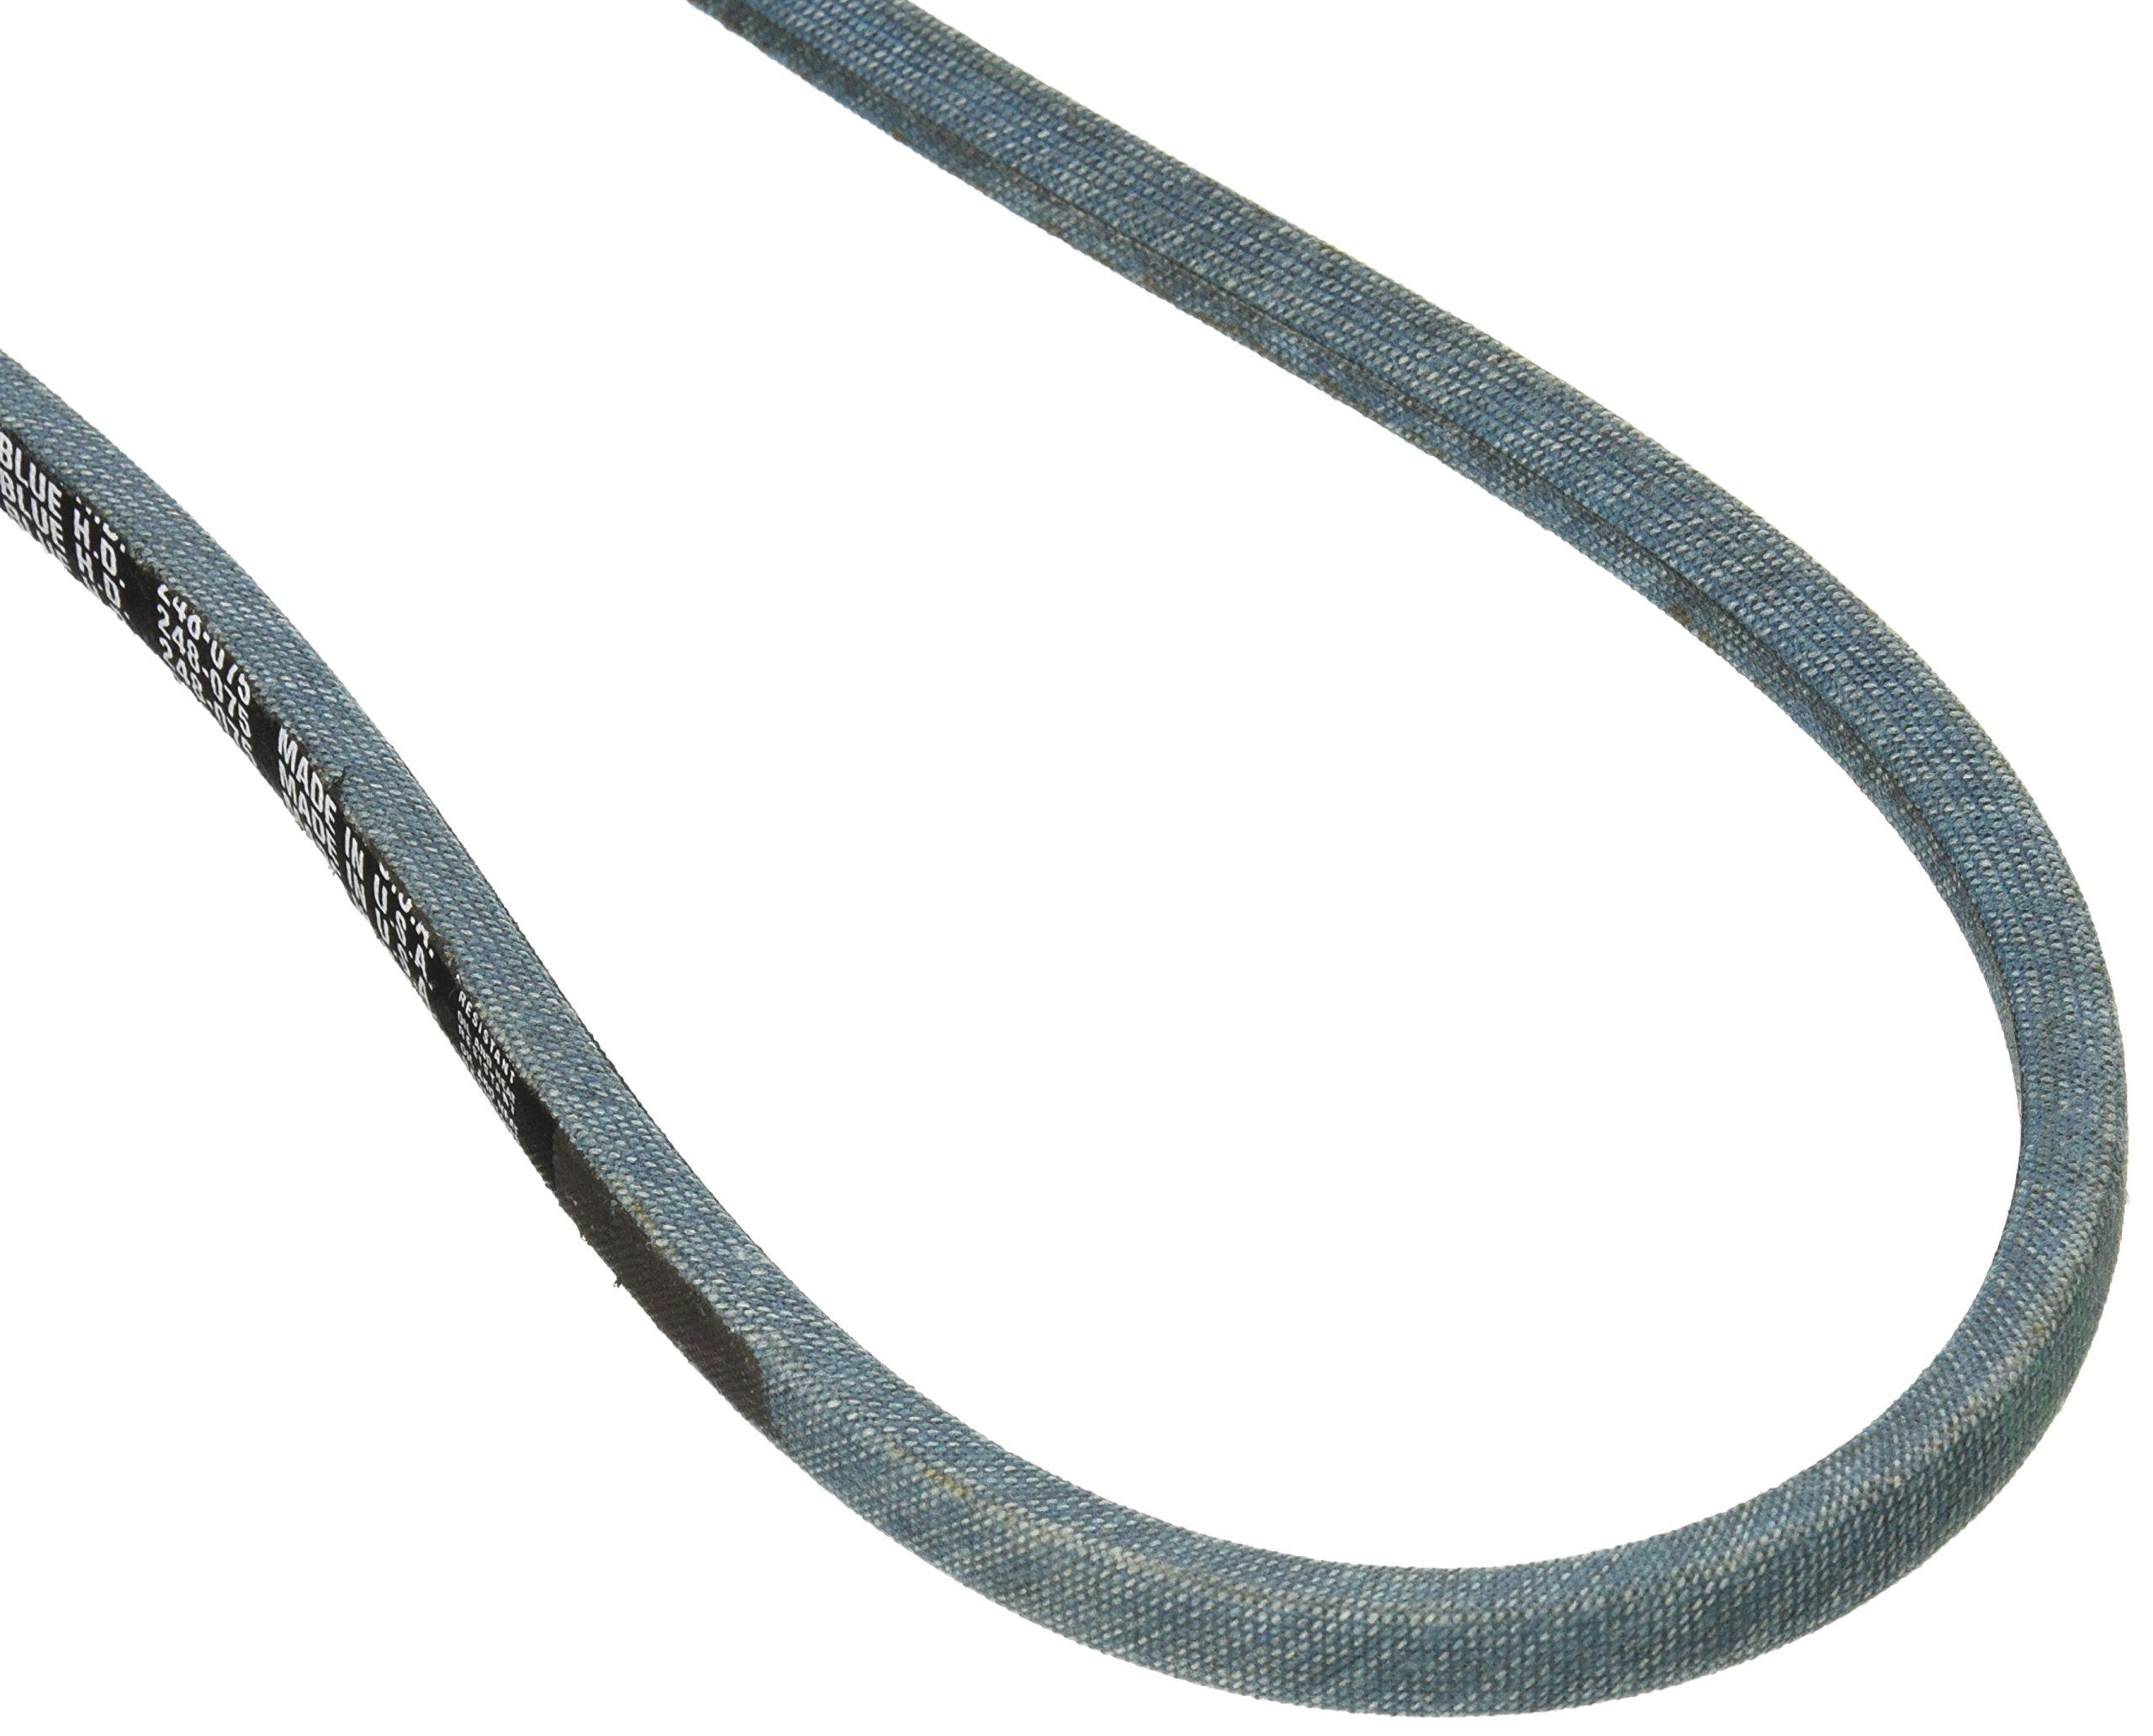 Stens 248-075 True-Blue Belt Replaces Gates 6875 Dayco L475 Goodyear 84750 Ariens 07210200 Troy Bilt 1724148 Massey Ferguson 1025557M1 Maxim 320272214 AYP 76275, 75-Inch by-1/2-inch